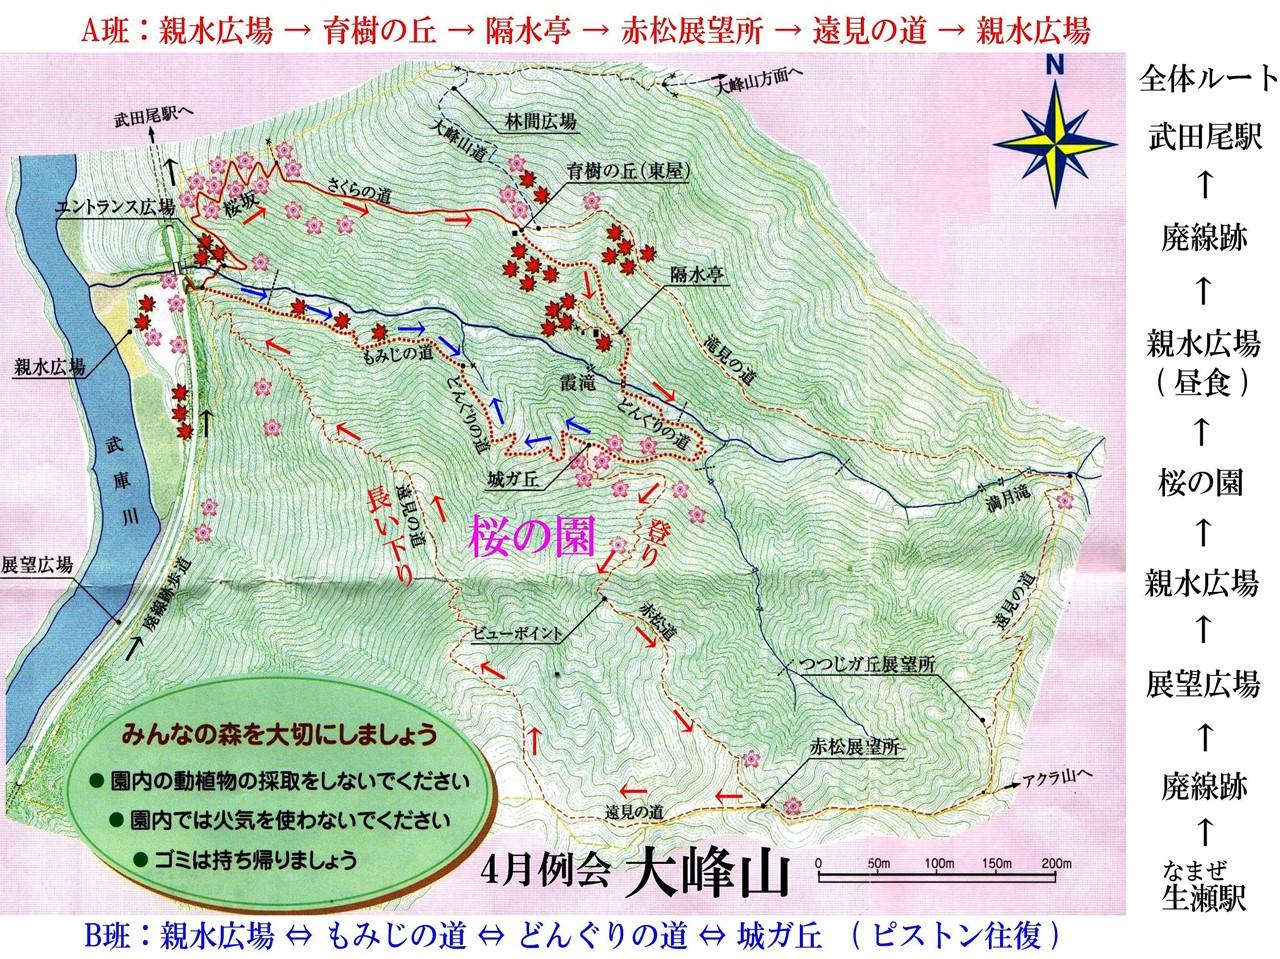 07b 桜の園ルートマップ